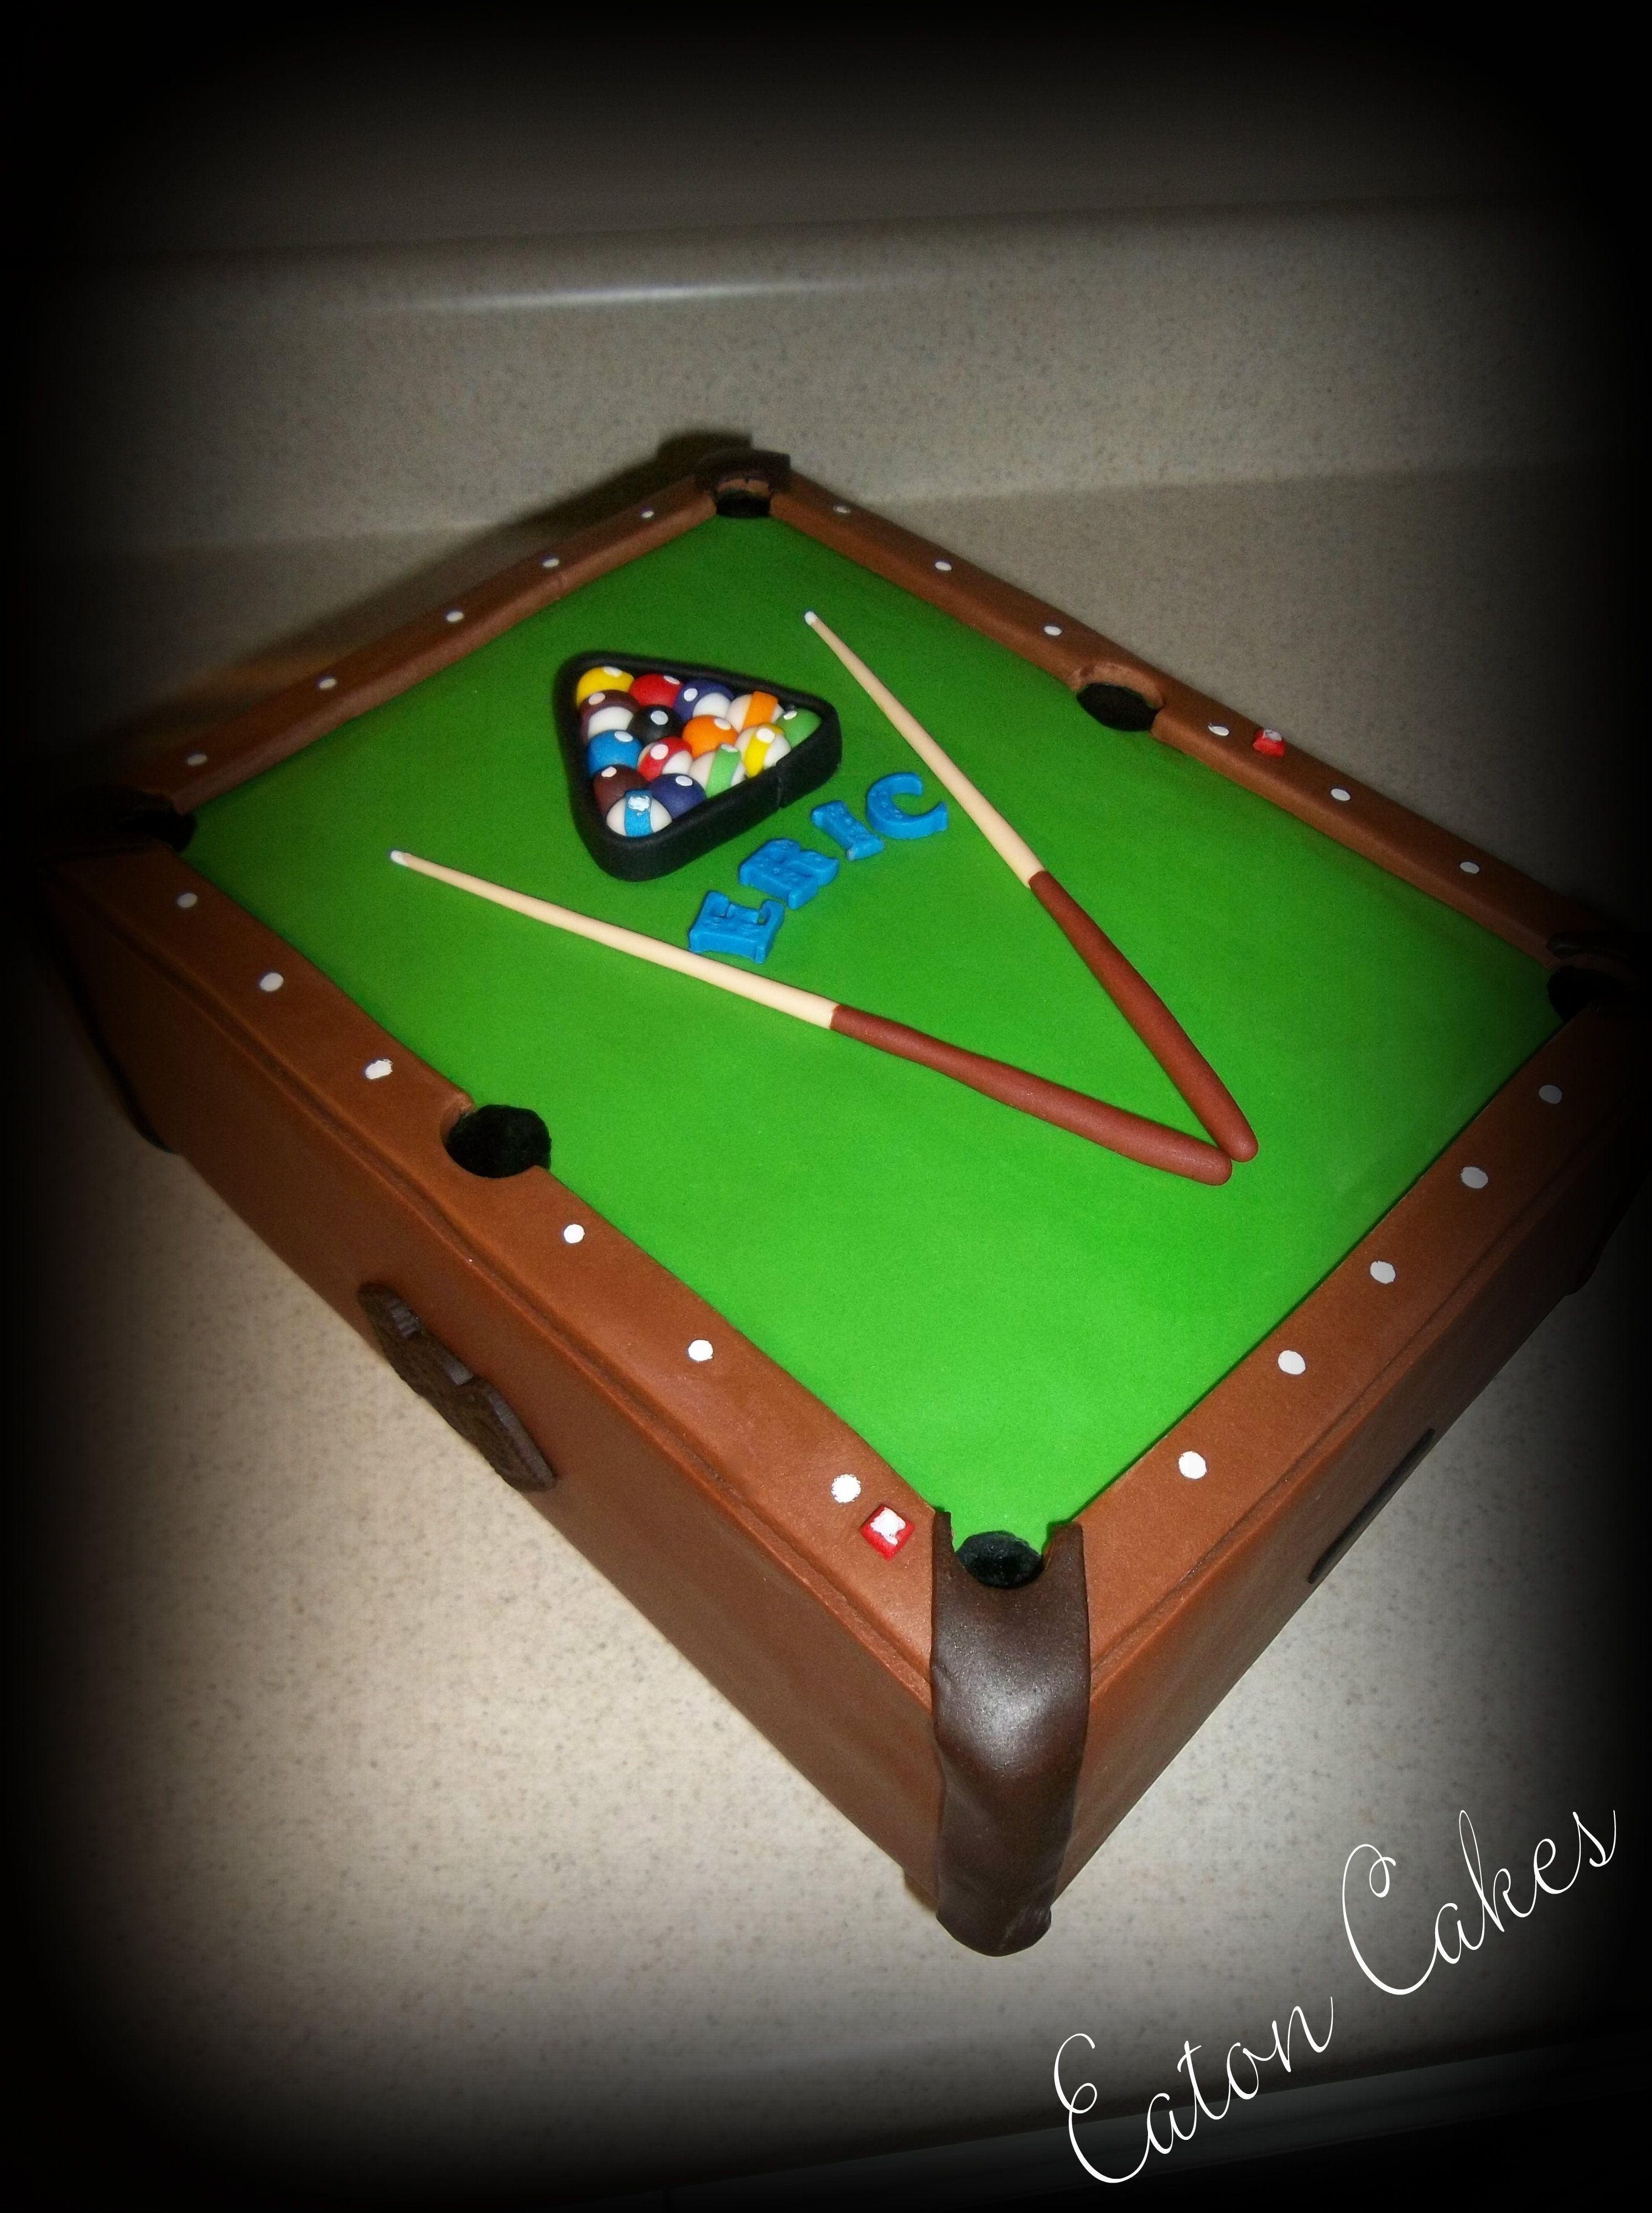 Højmoderne Pool table cake | Cakes! & cupcakes :) | Pool table cake, Cake RT-75